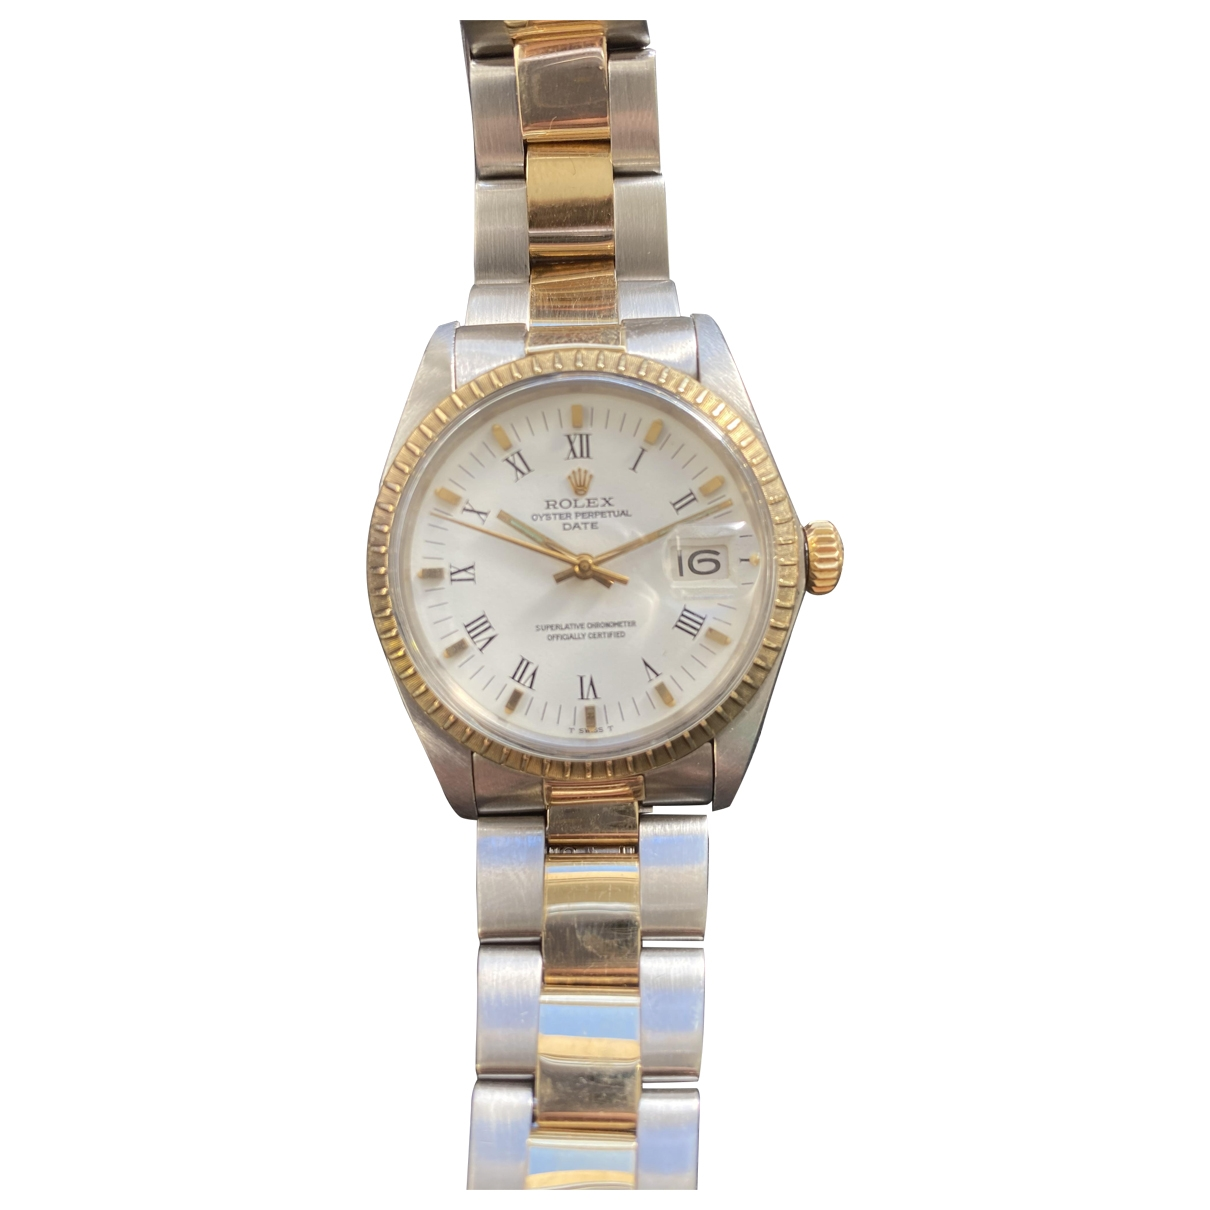 Rolex Oyster Perpetual 34mm Uhr in  Gold Gold und Stahl